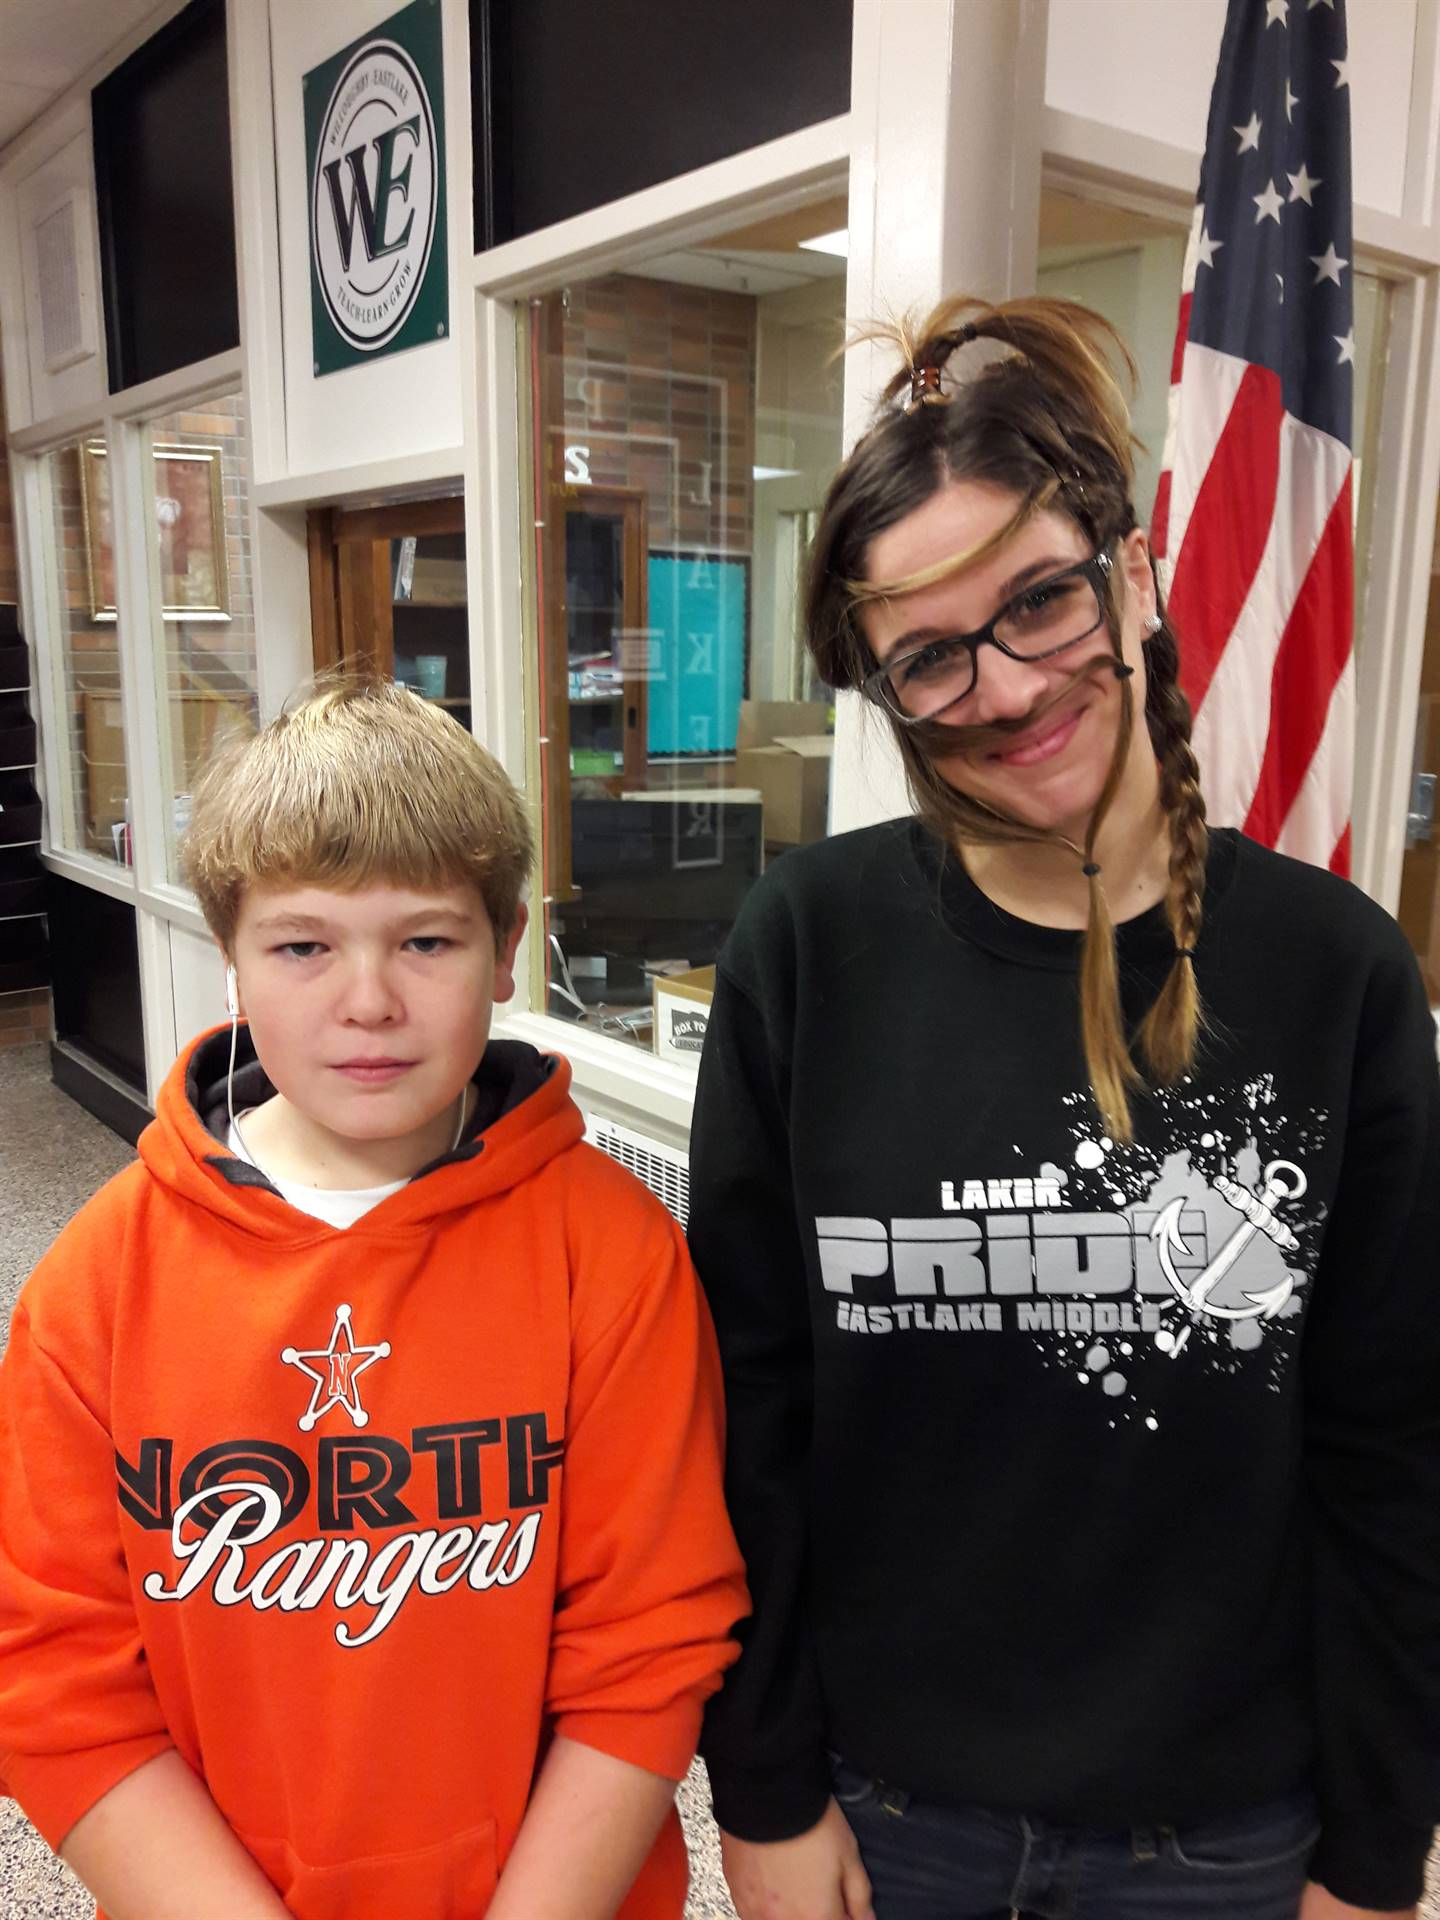 Mrs. Virostek with her Hair Stylist Bryce